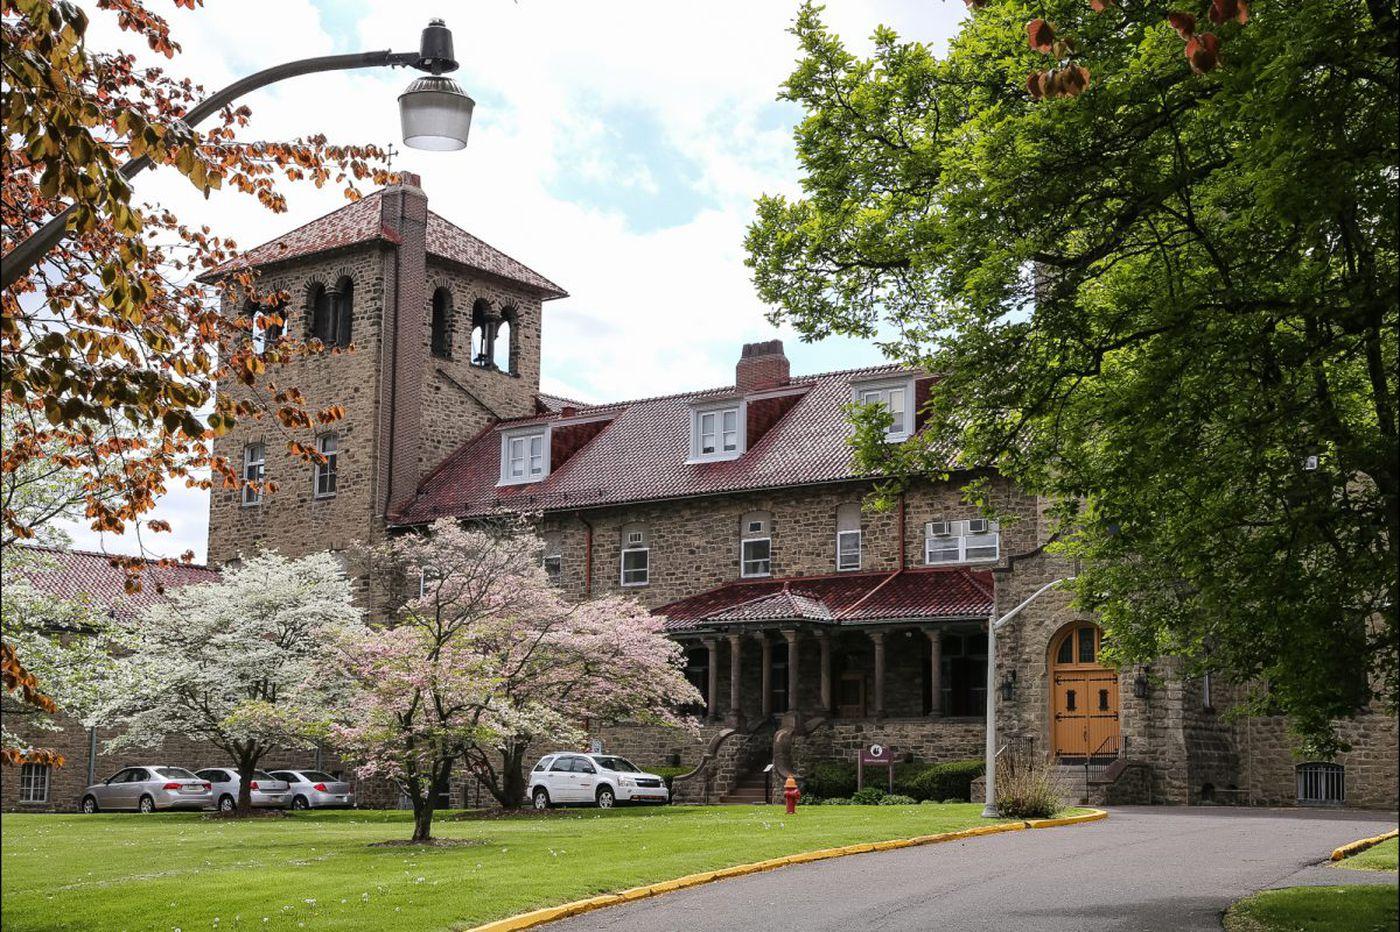 St. Katharine Drexel shrine estate under contract to developer Aquinas with senior housing plan